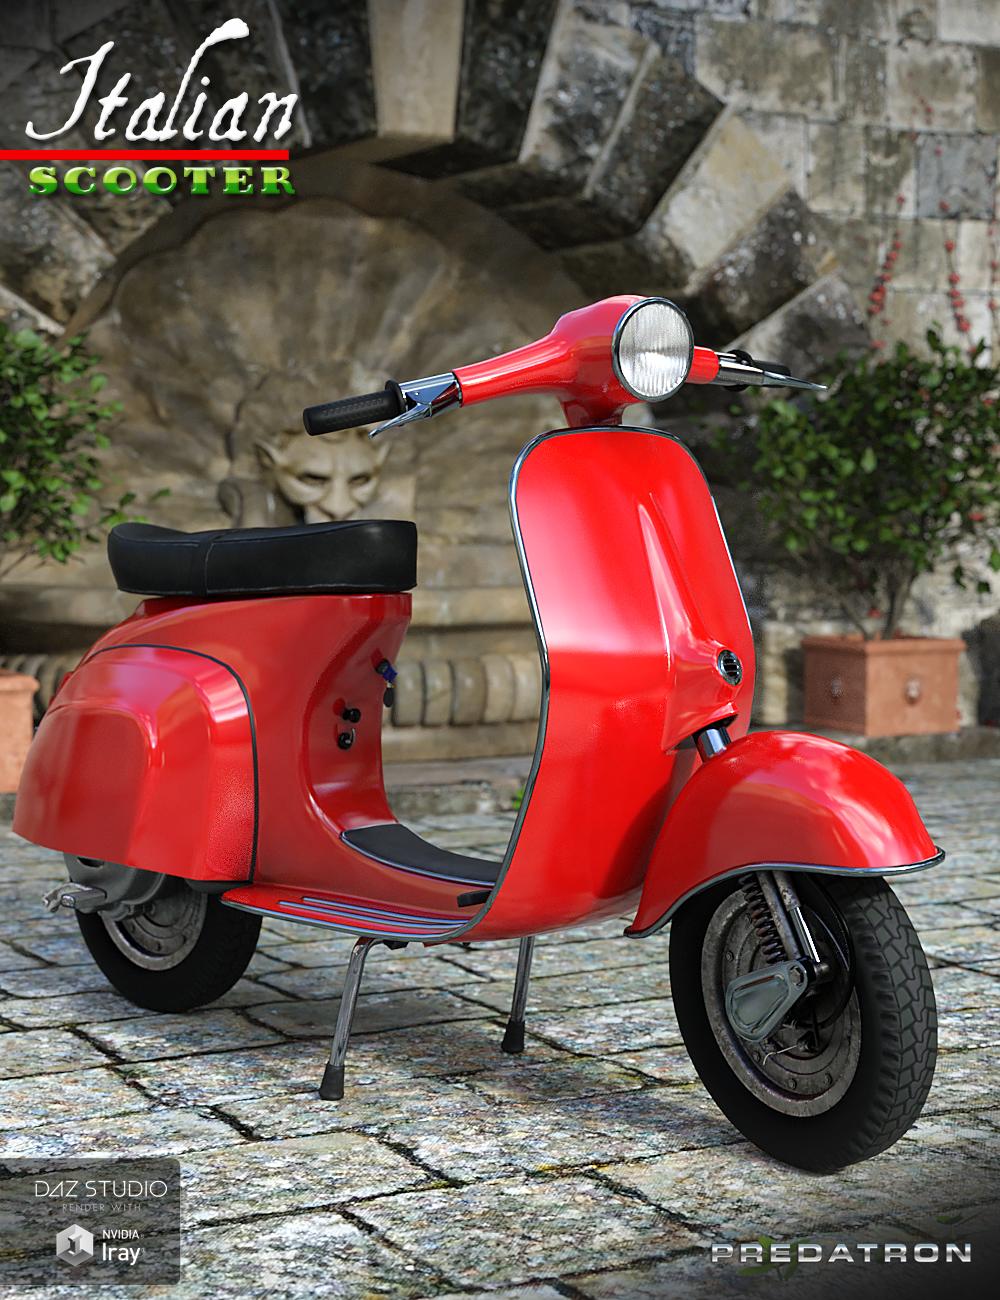 Italian Scooter by: PredatronDiane, 3D Models by Daz 3D